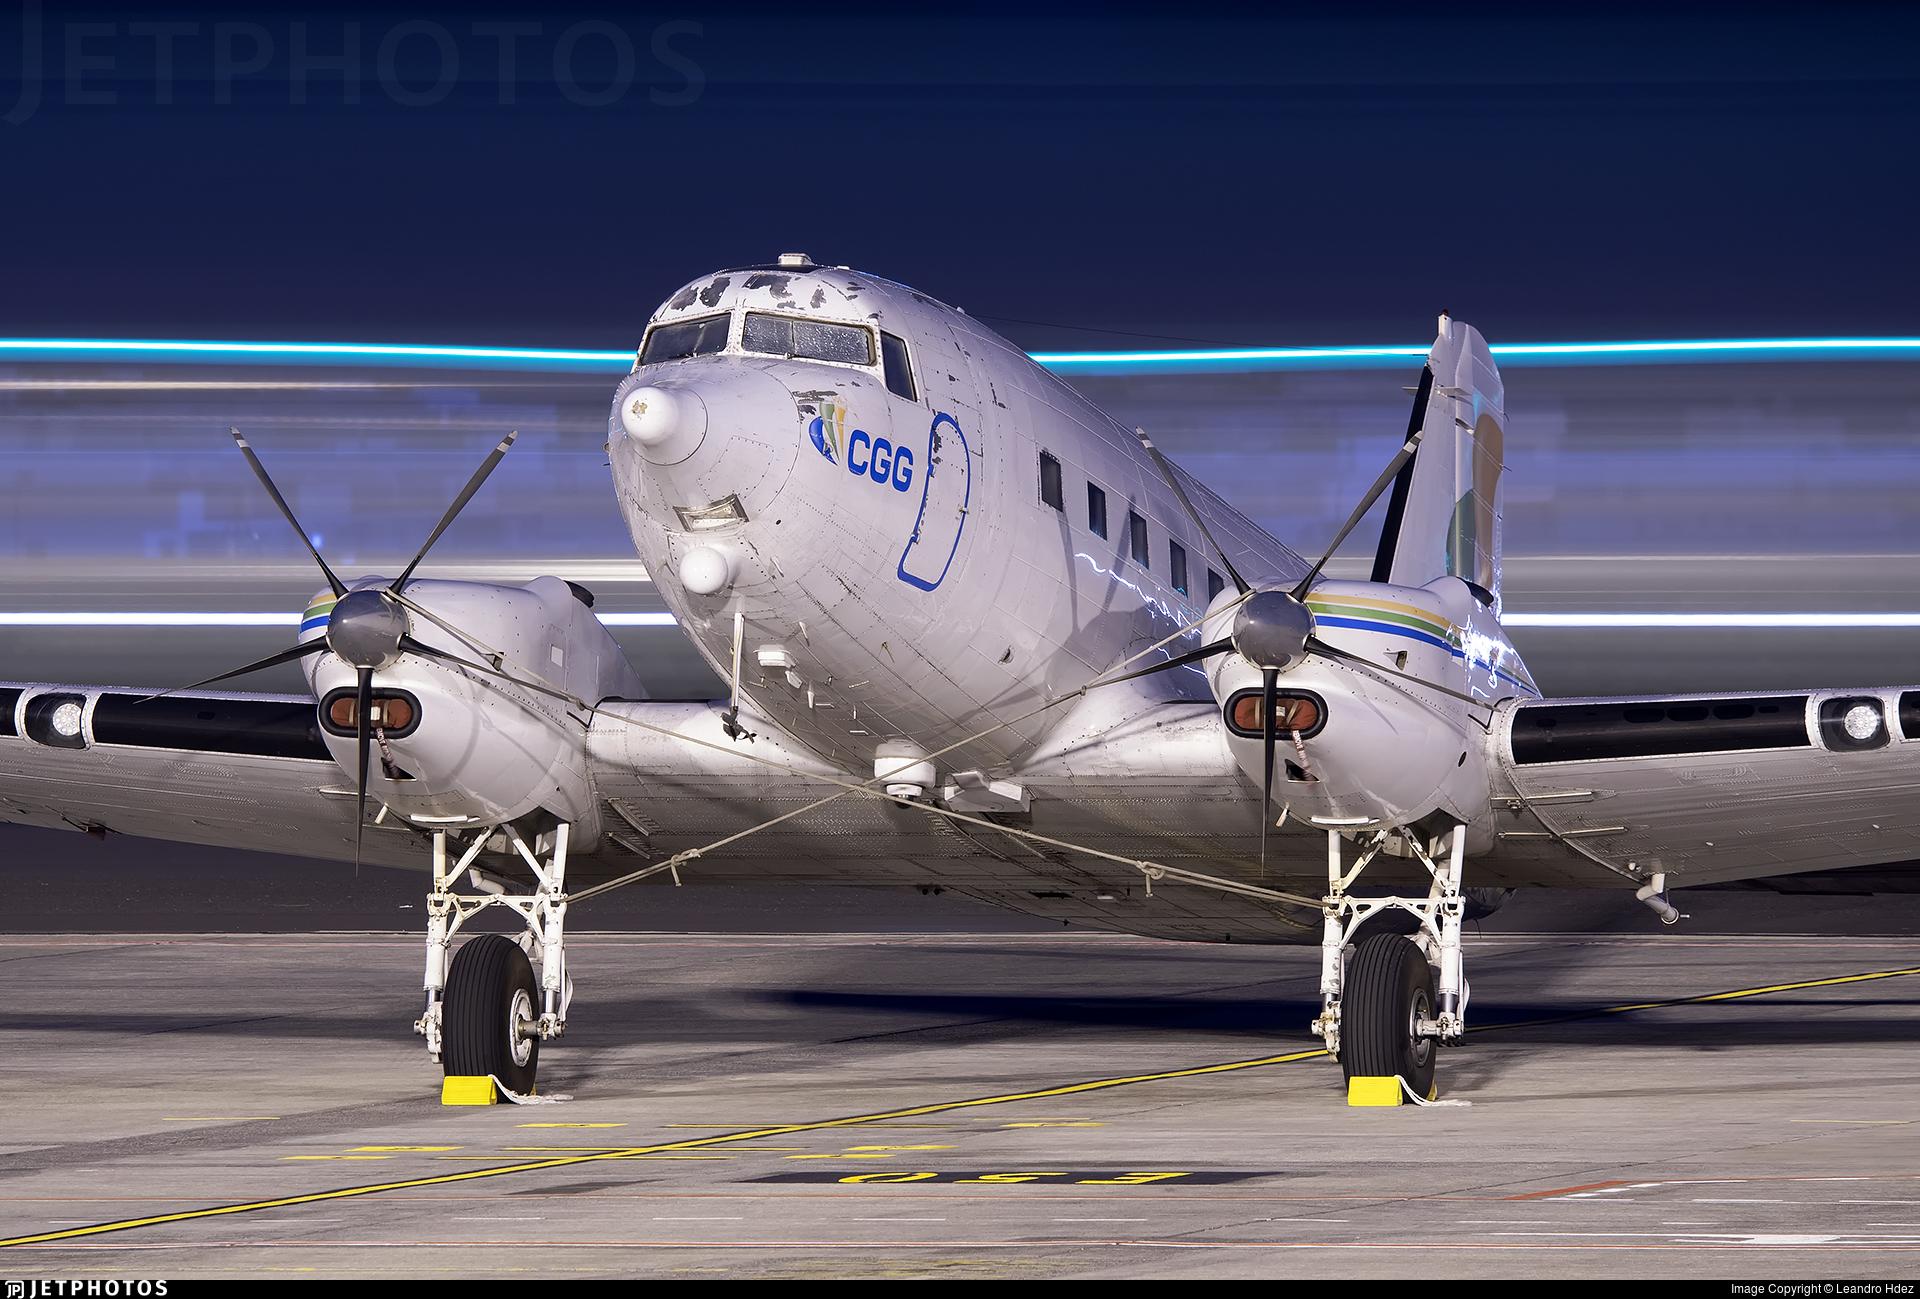 C-GGSU - Basler BT-67 - CGG Aviation